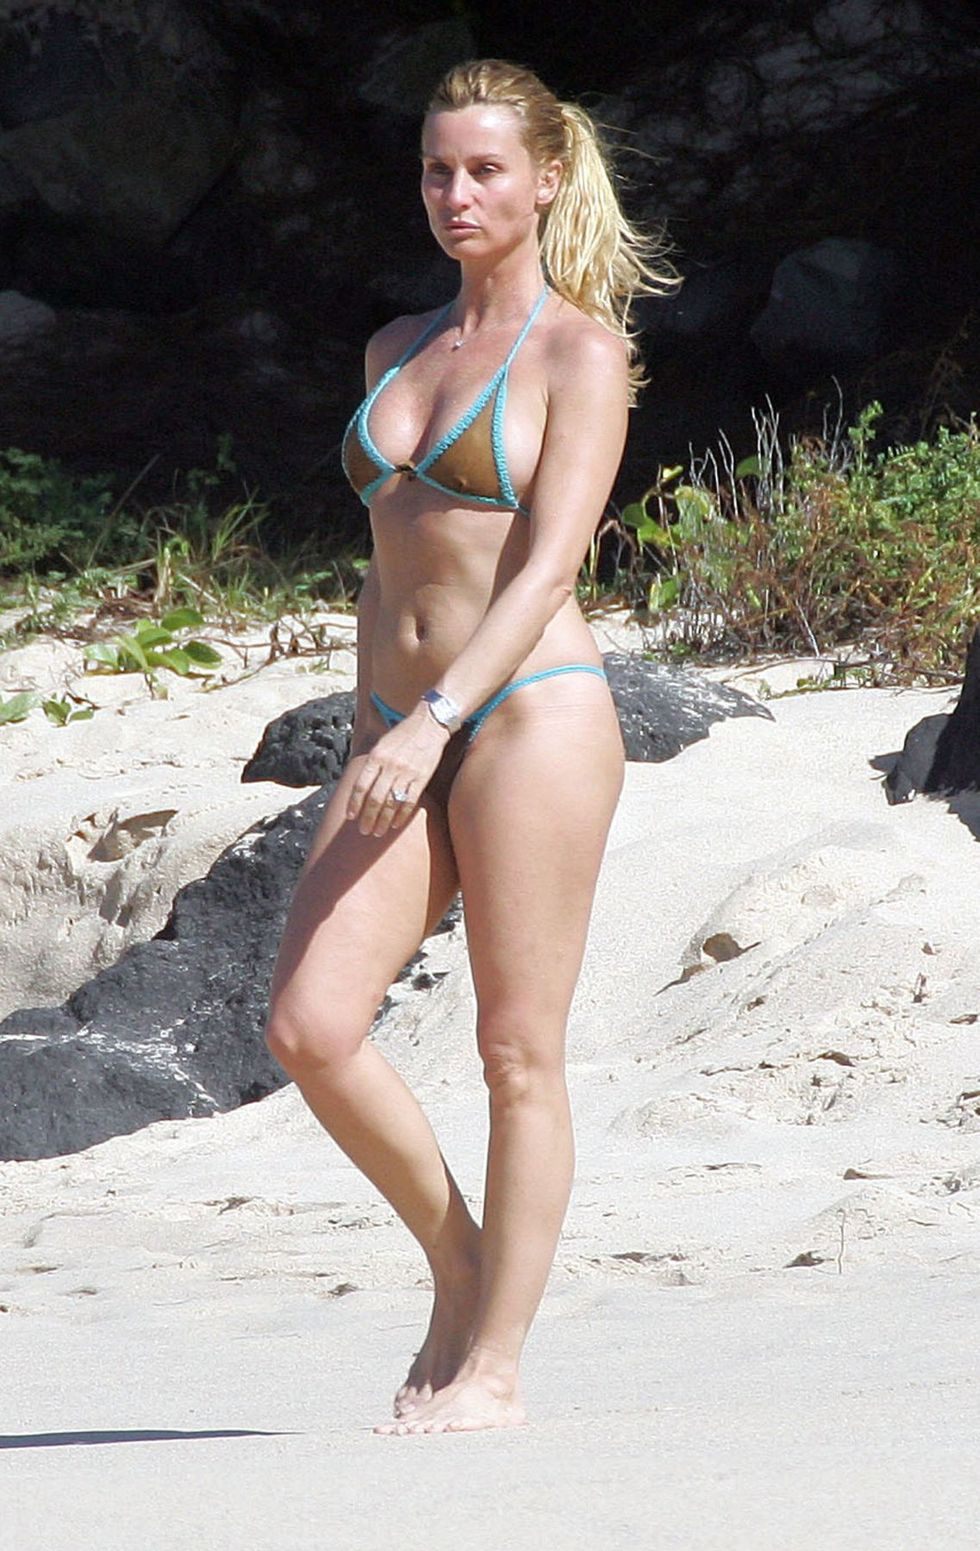 nicollette-sherdian-bikini-candids-at-the-beach-in-saint-barthelemy-02